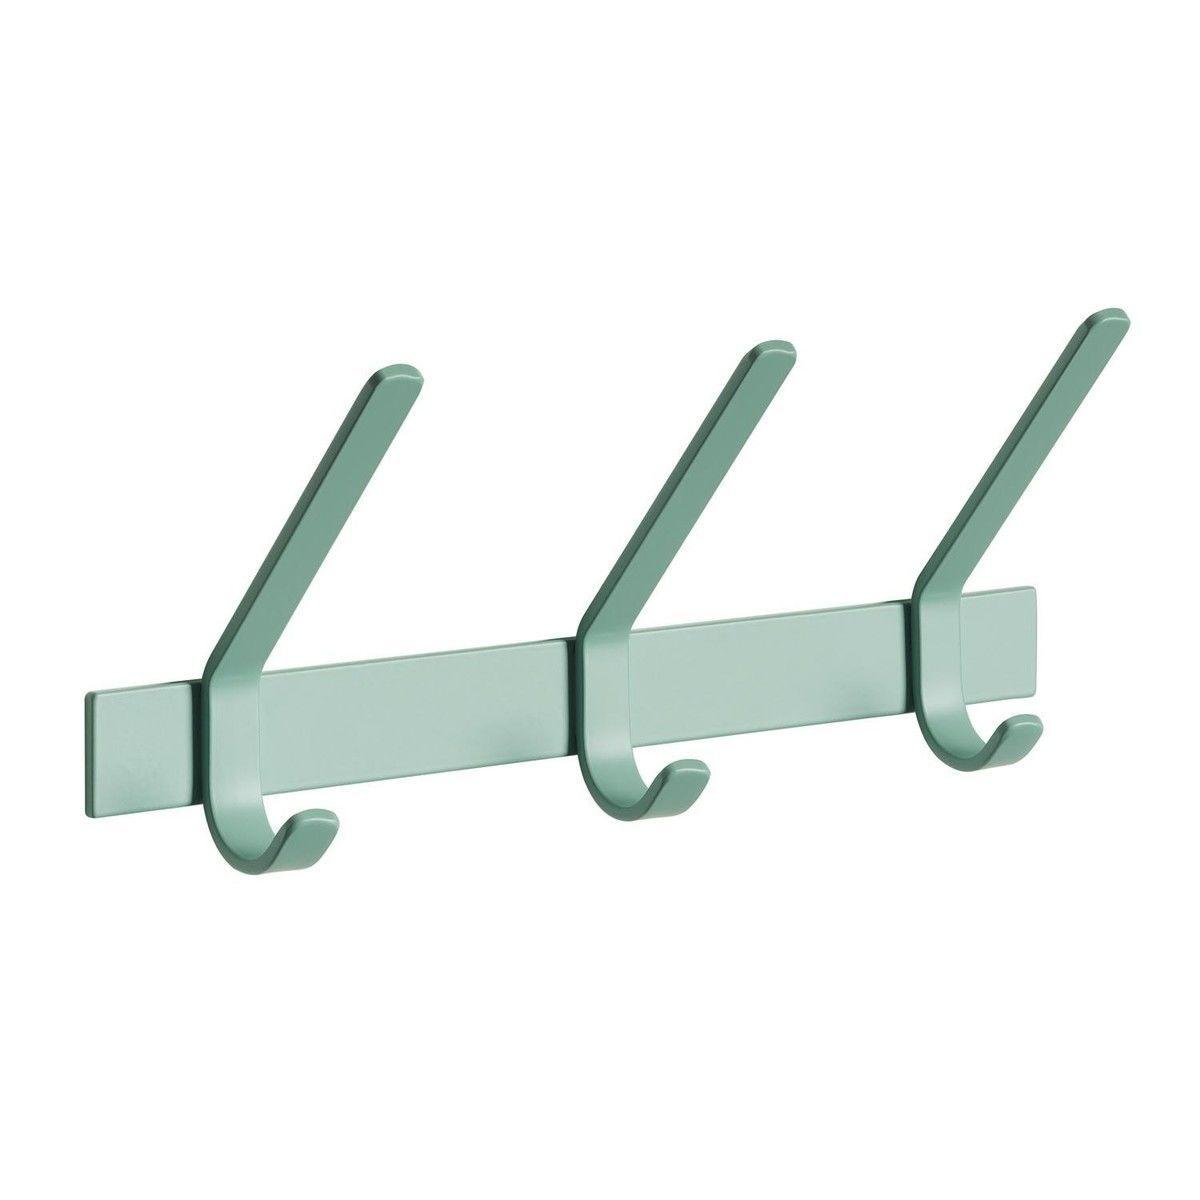 Pipe 3 led suspension lamp decor walther ambientedirect com - E Fk Uni Wall Wardrobe Mint Hooks